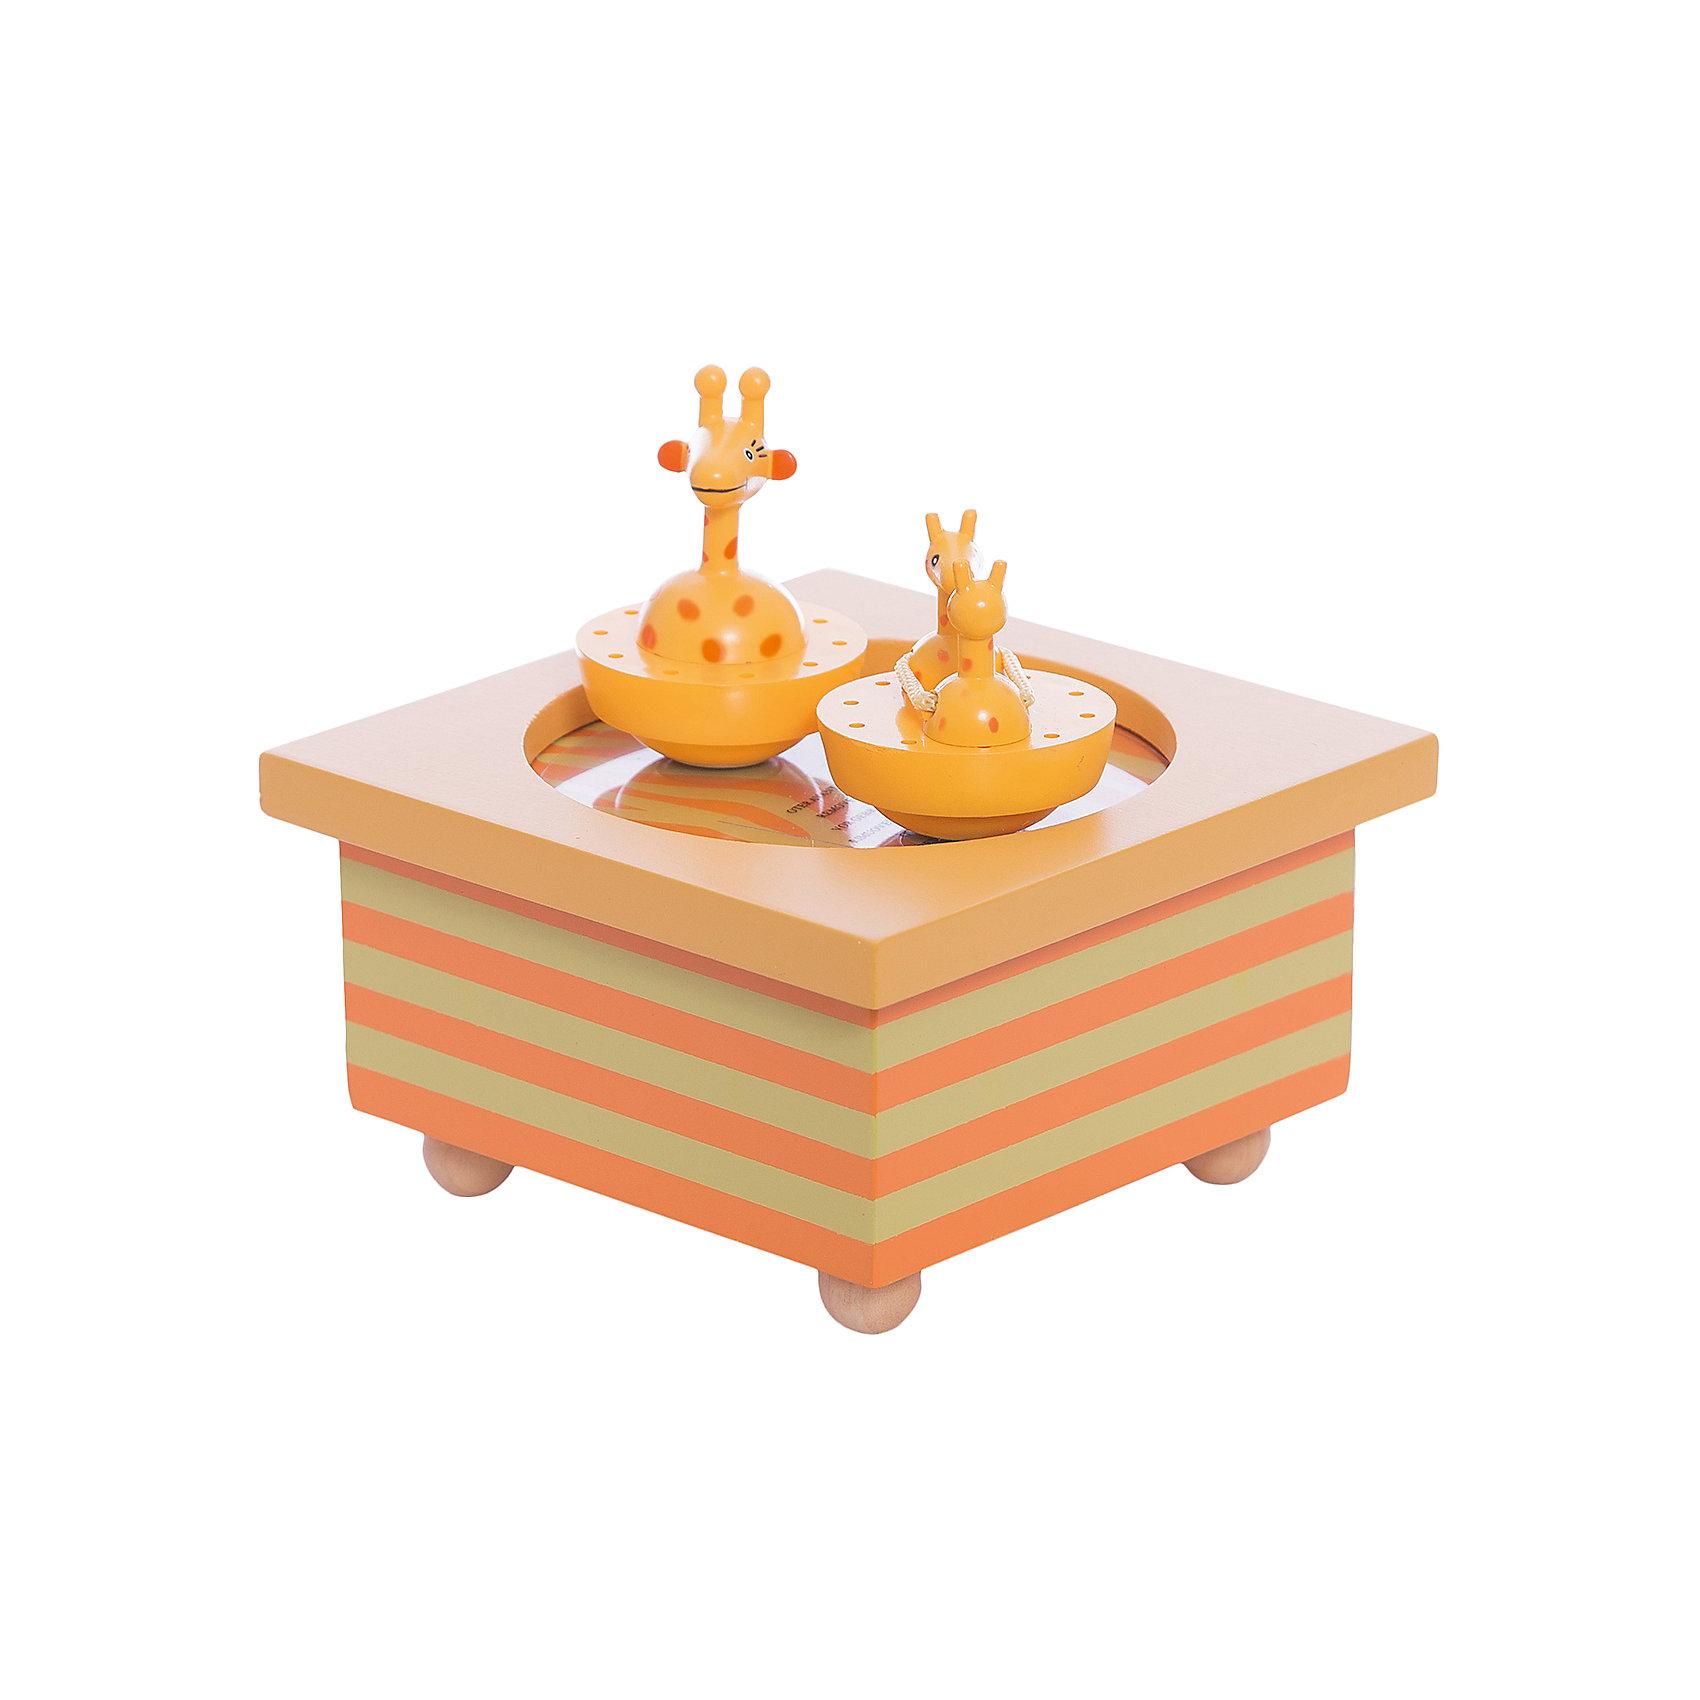 TROUSSELIER Музыкальная шкатулка, серия Жираф, Trousselier jakos музыкальная шкатулка феи в листьях